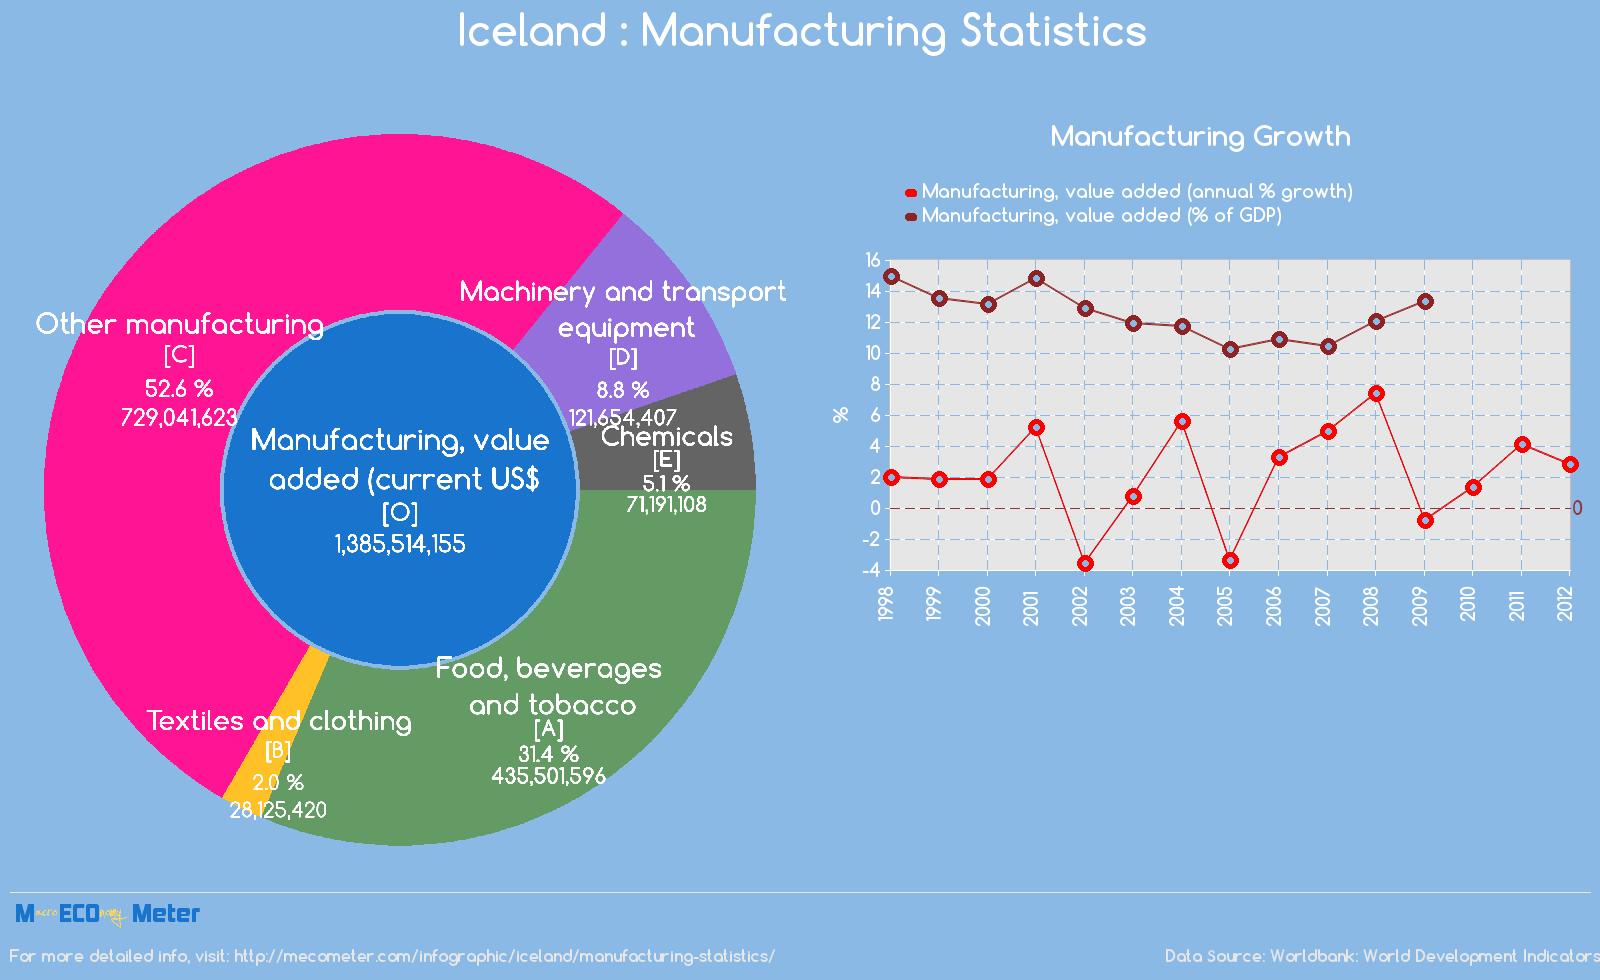 Iceland : Manufacturing Statistics